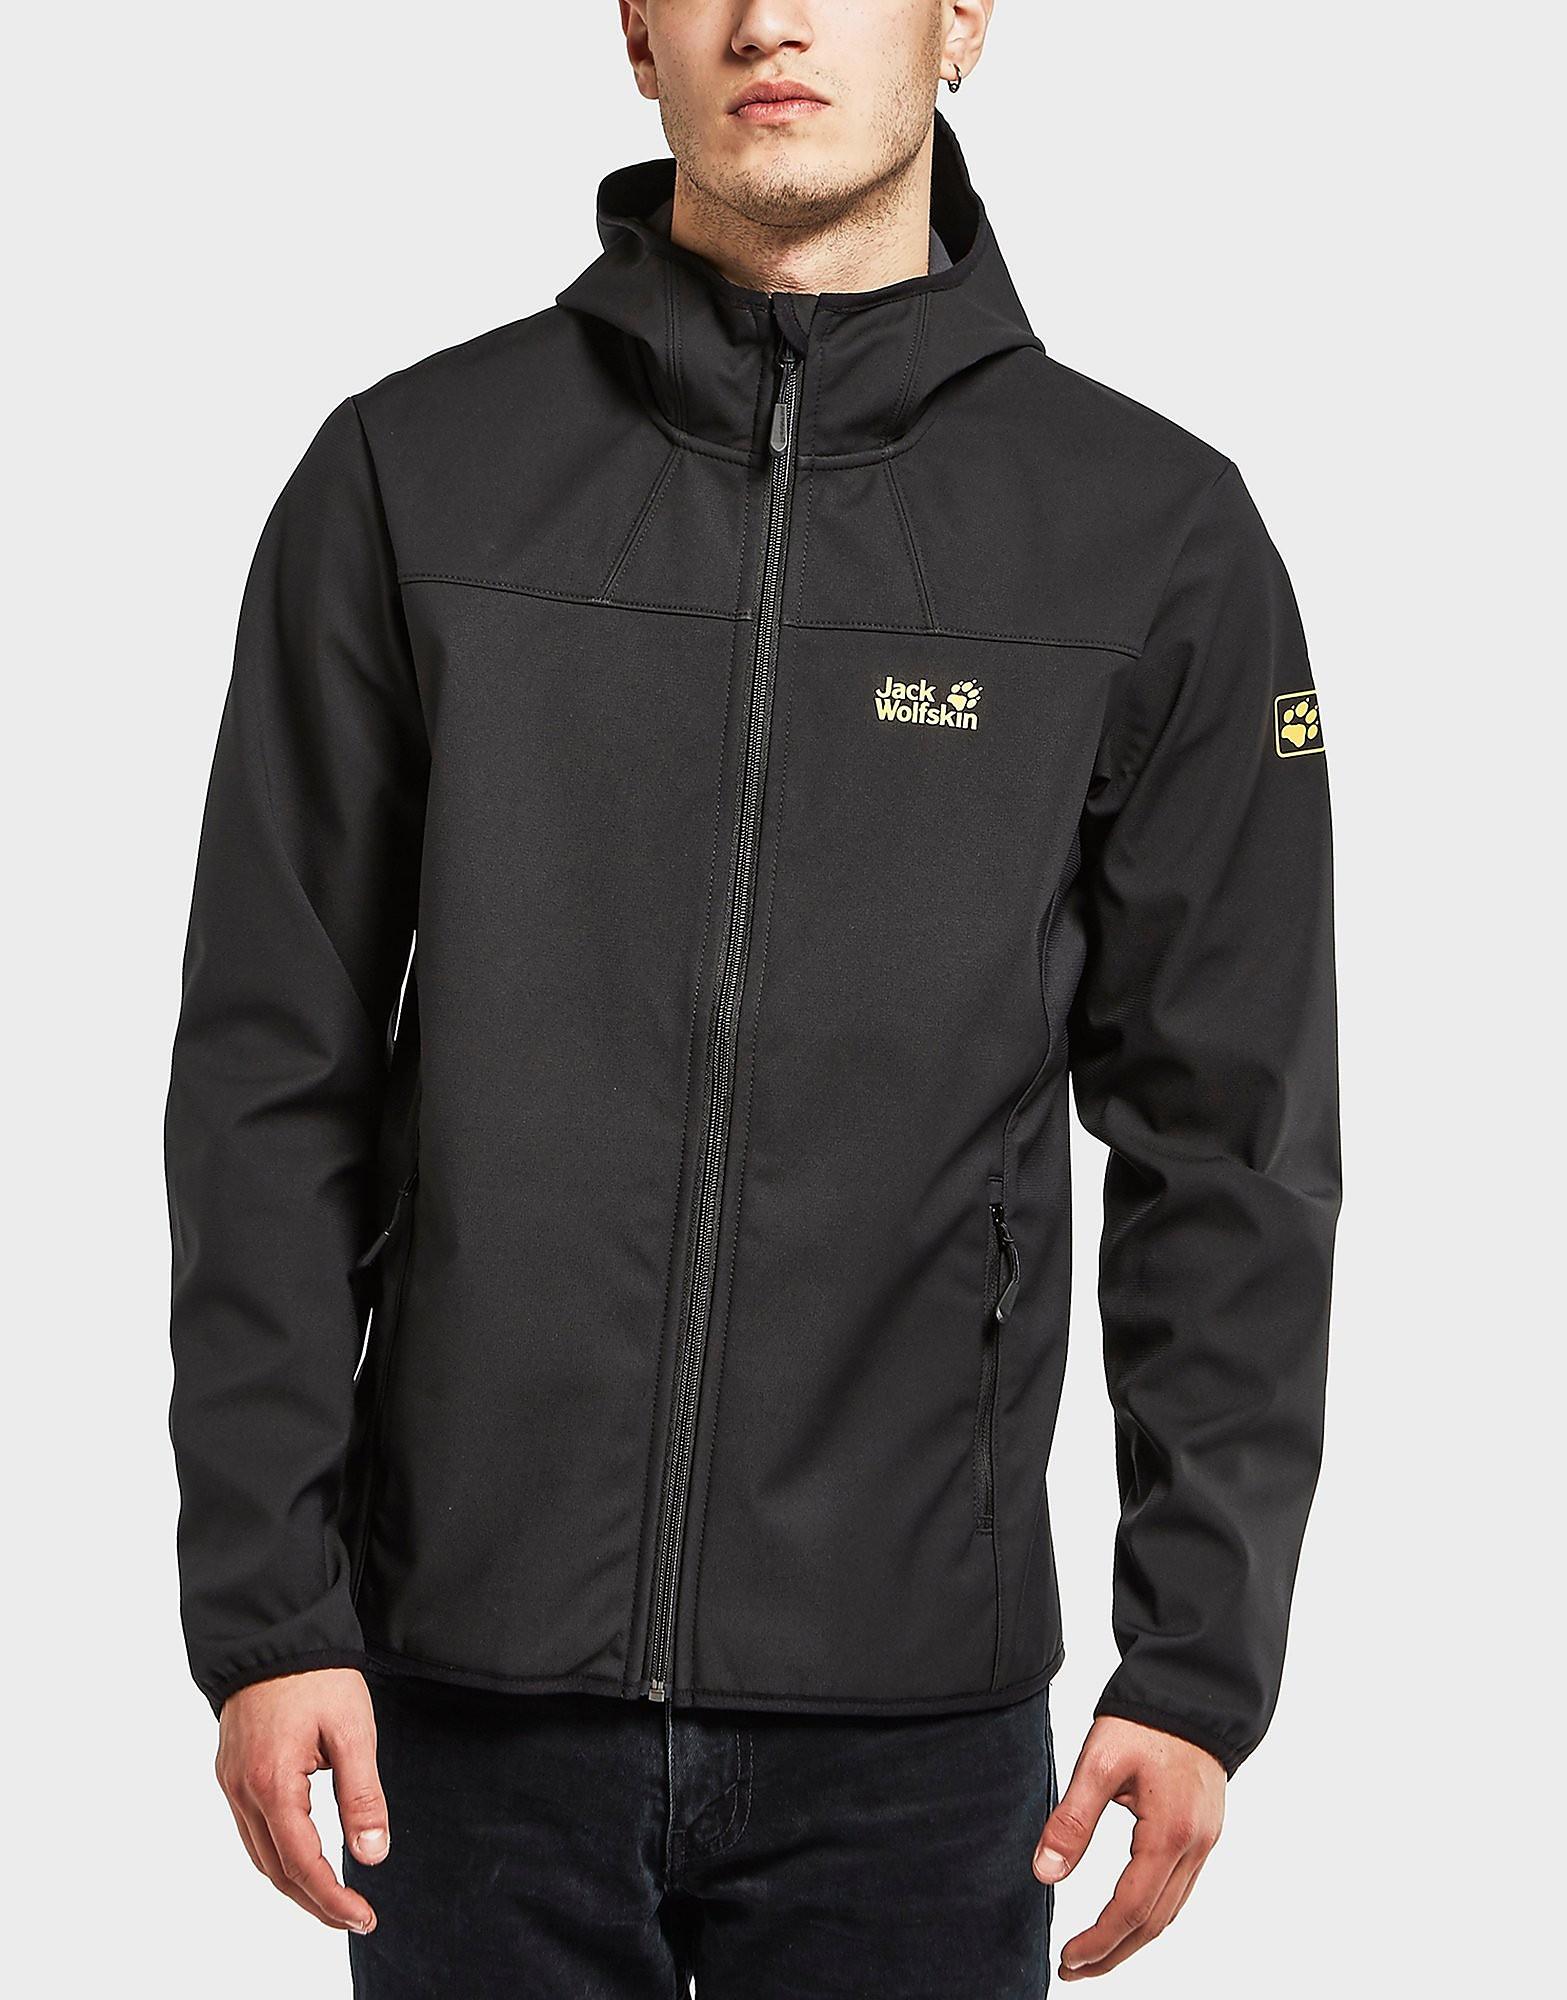 Jack Wolfskin Northern Point Shell Jacket